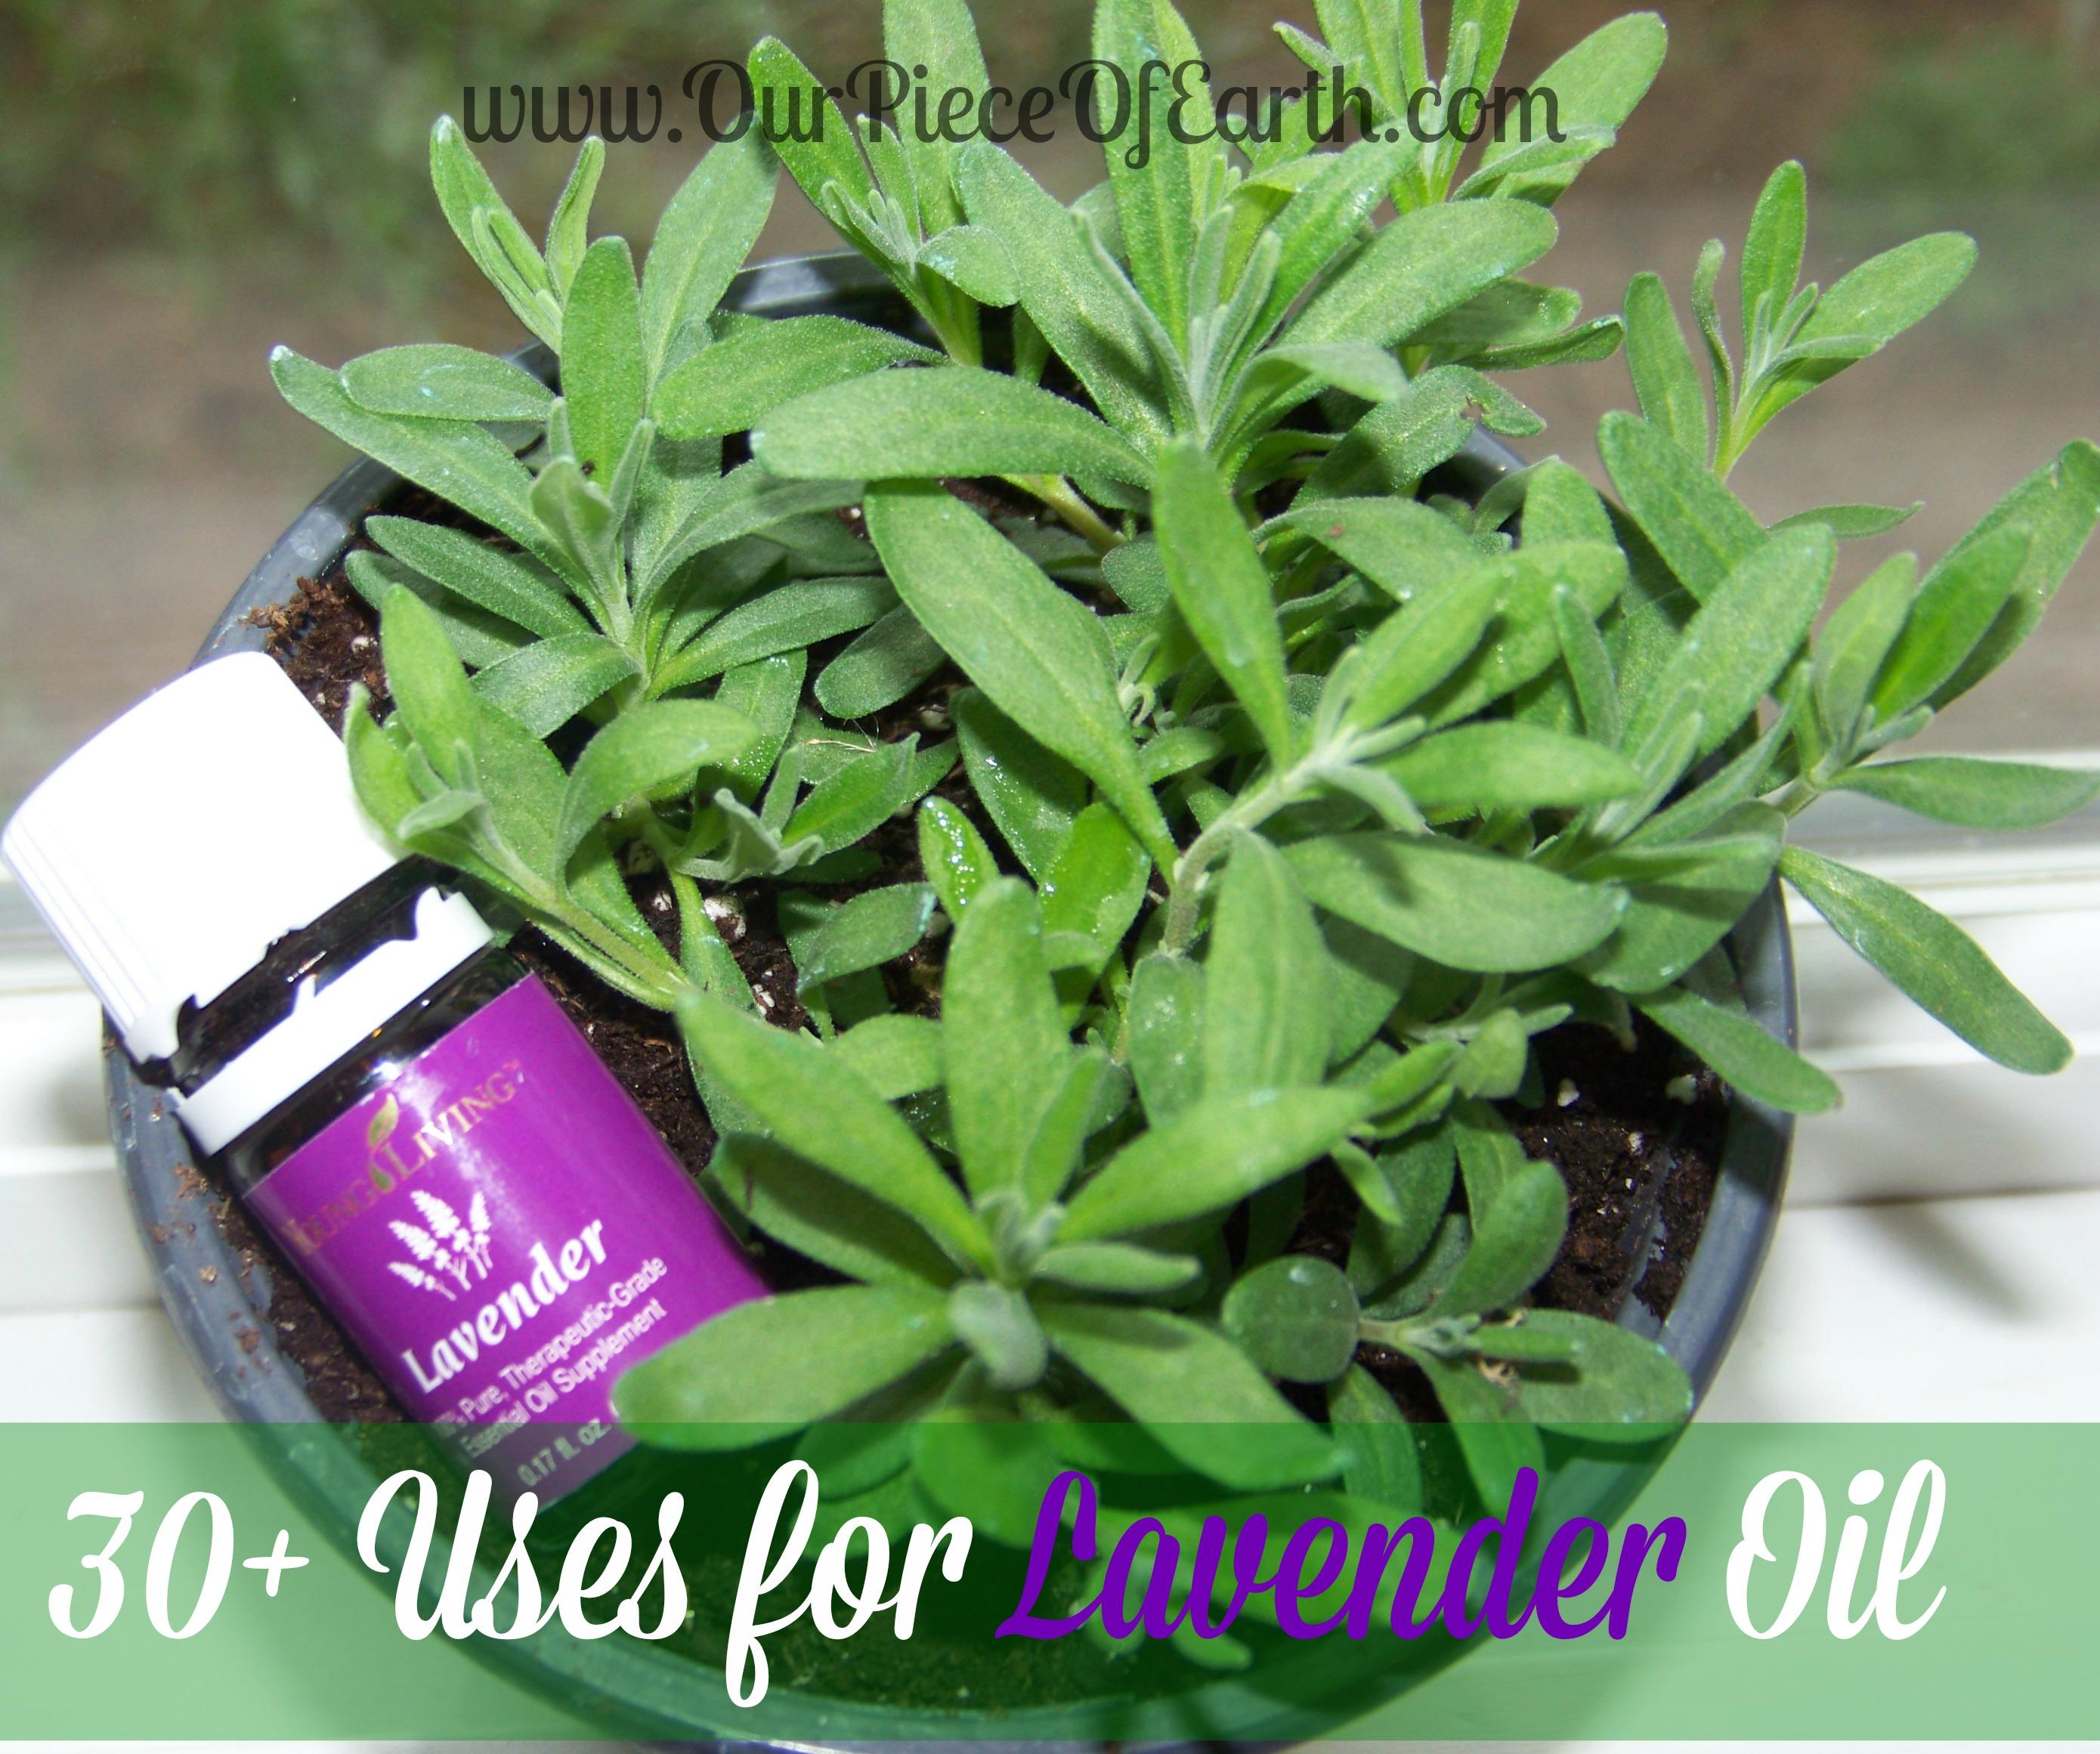 30+ Uses for Lavender Oil